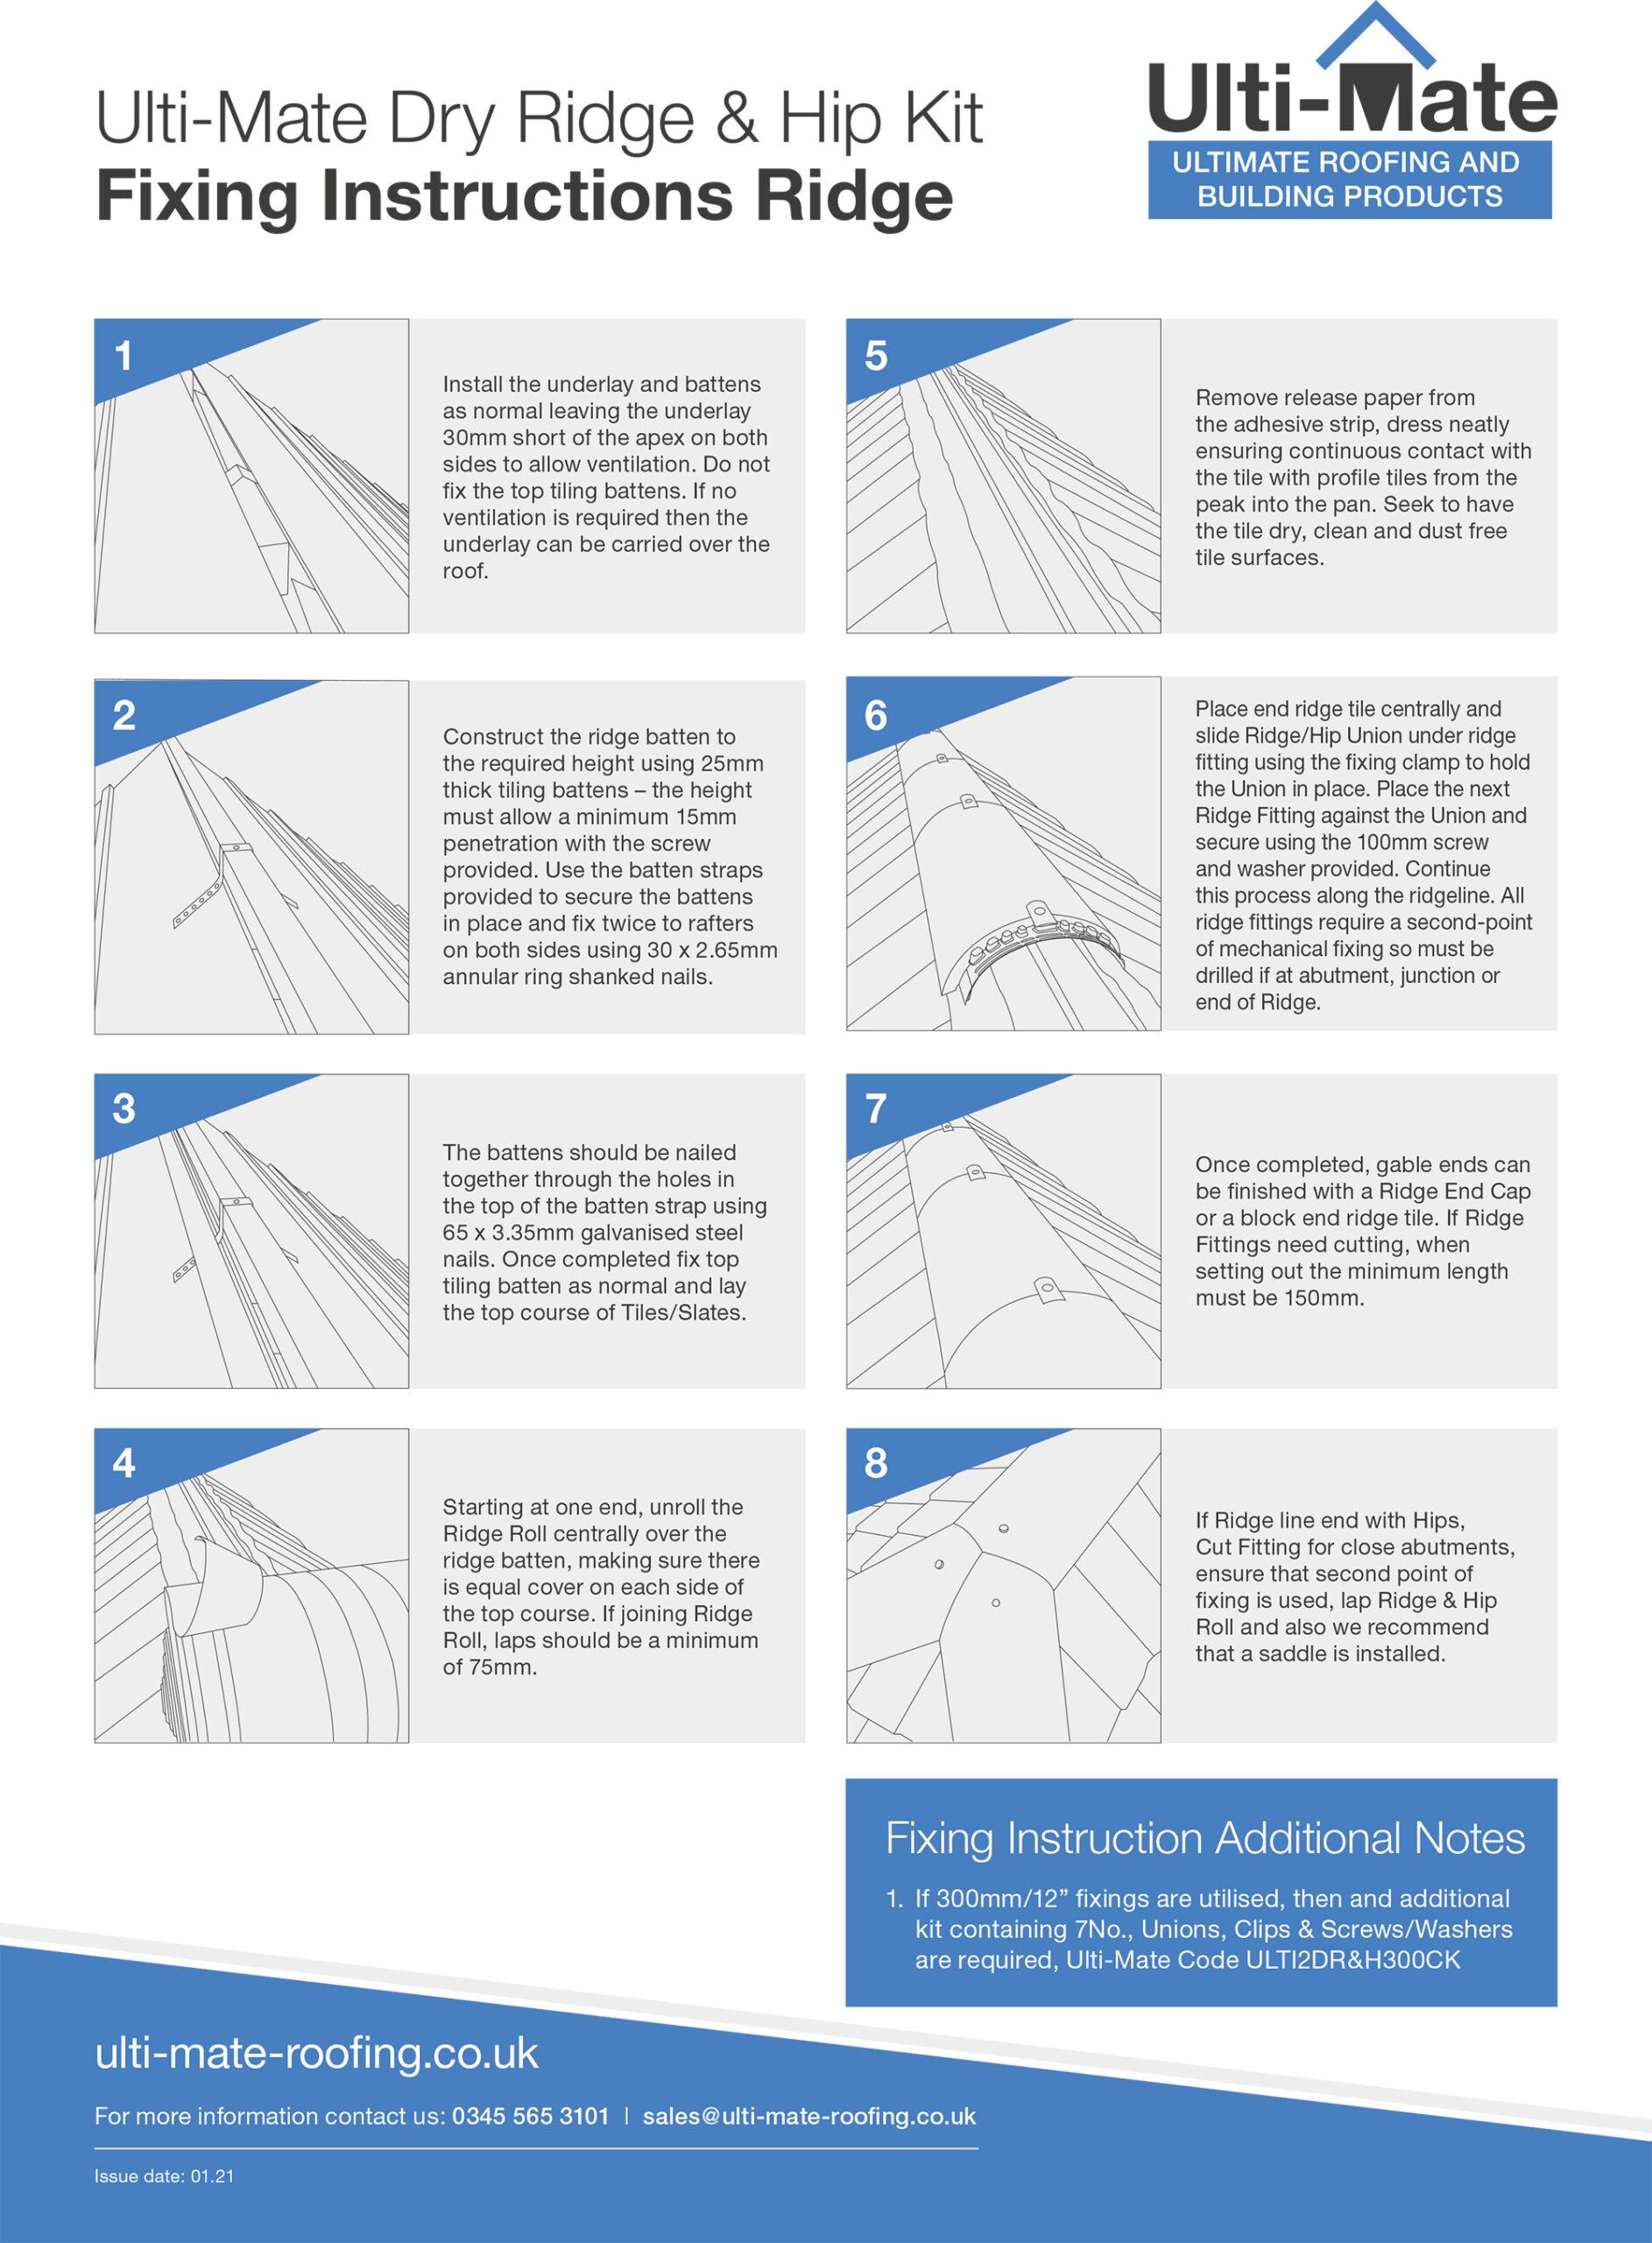 fixing-instructions-ridge